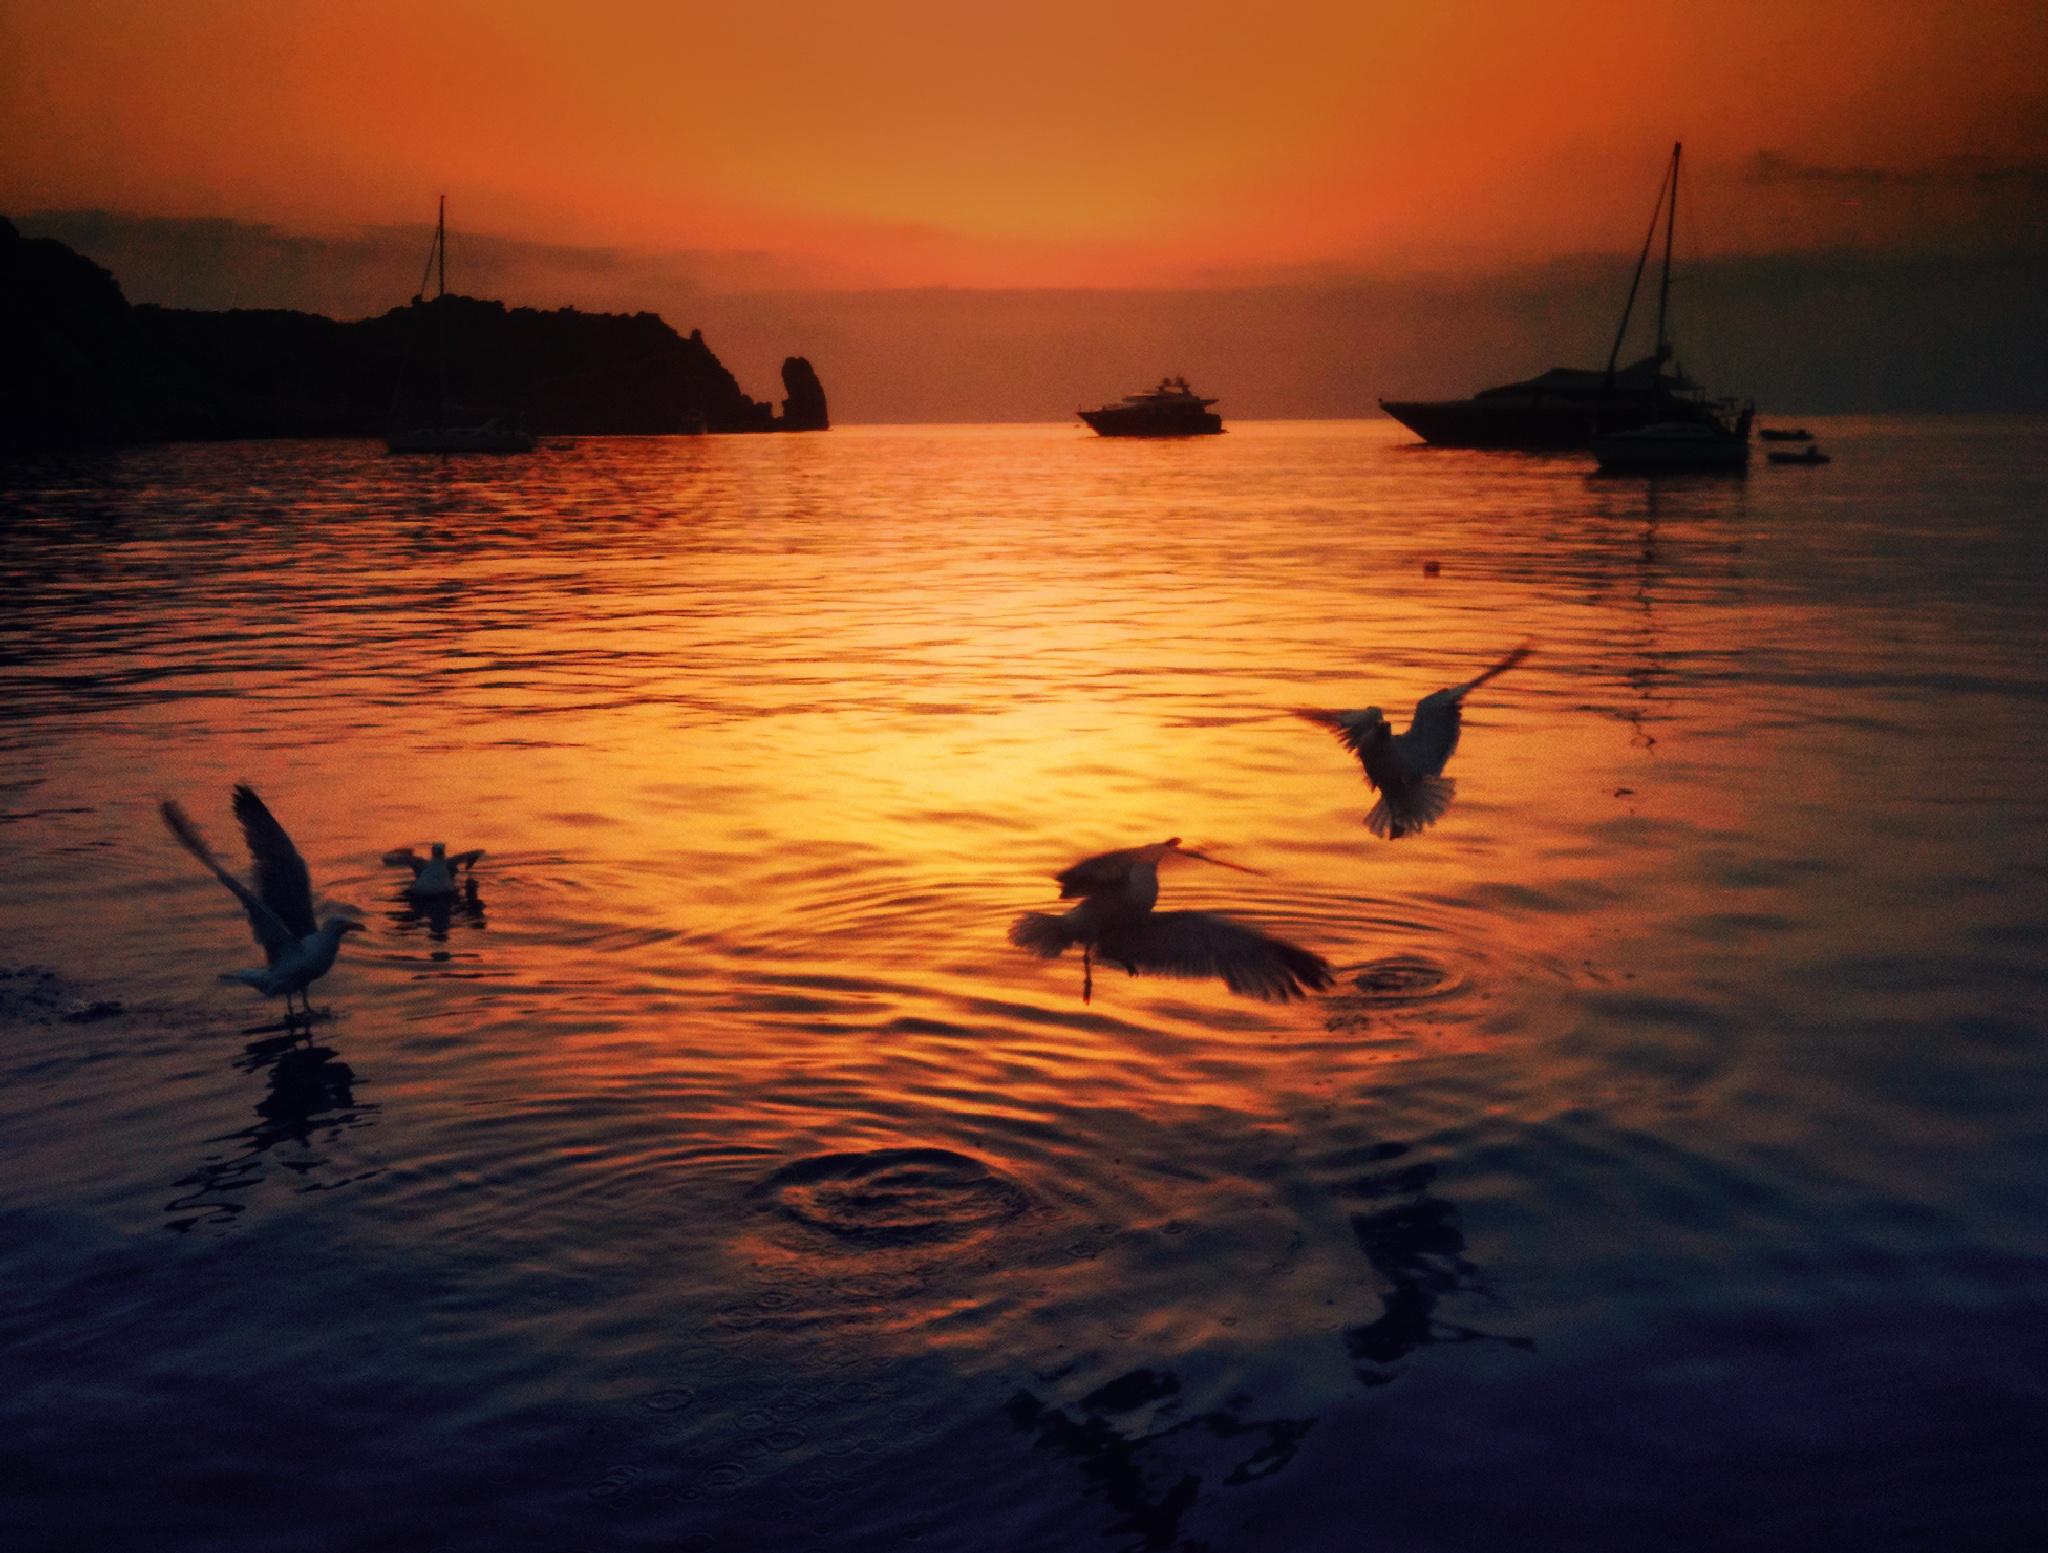 Seagulls at sunset by Roberto Scordino